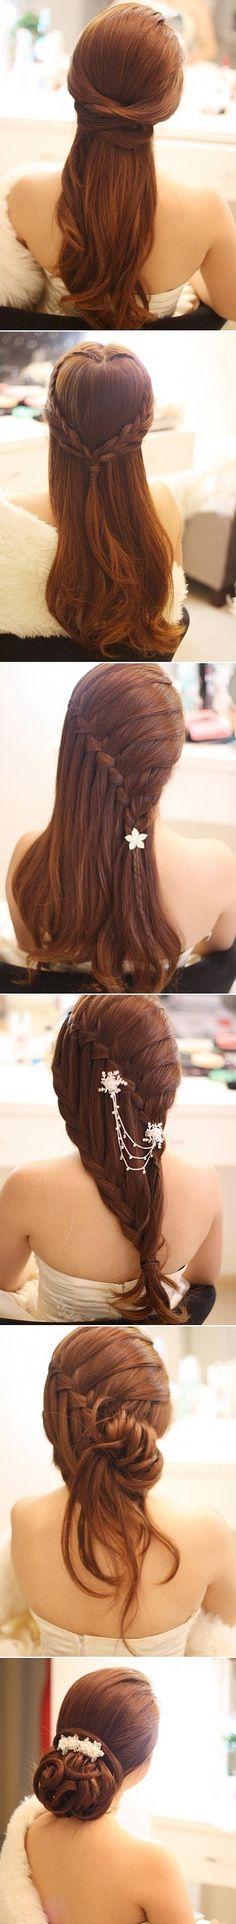 Peinados de fiesta.